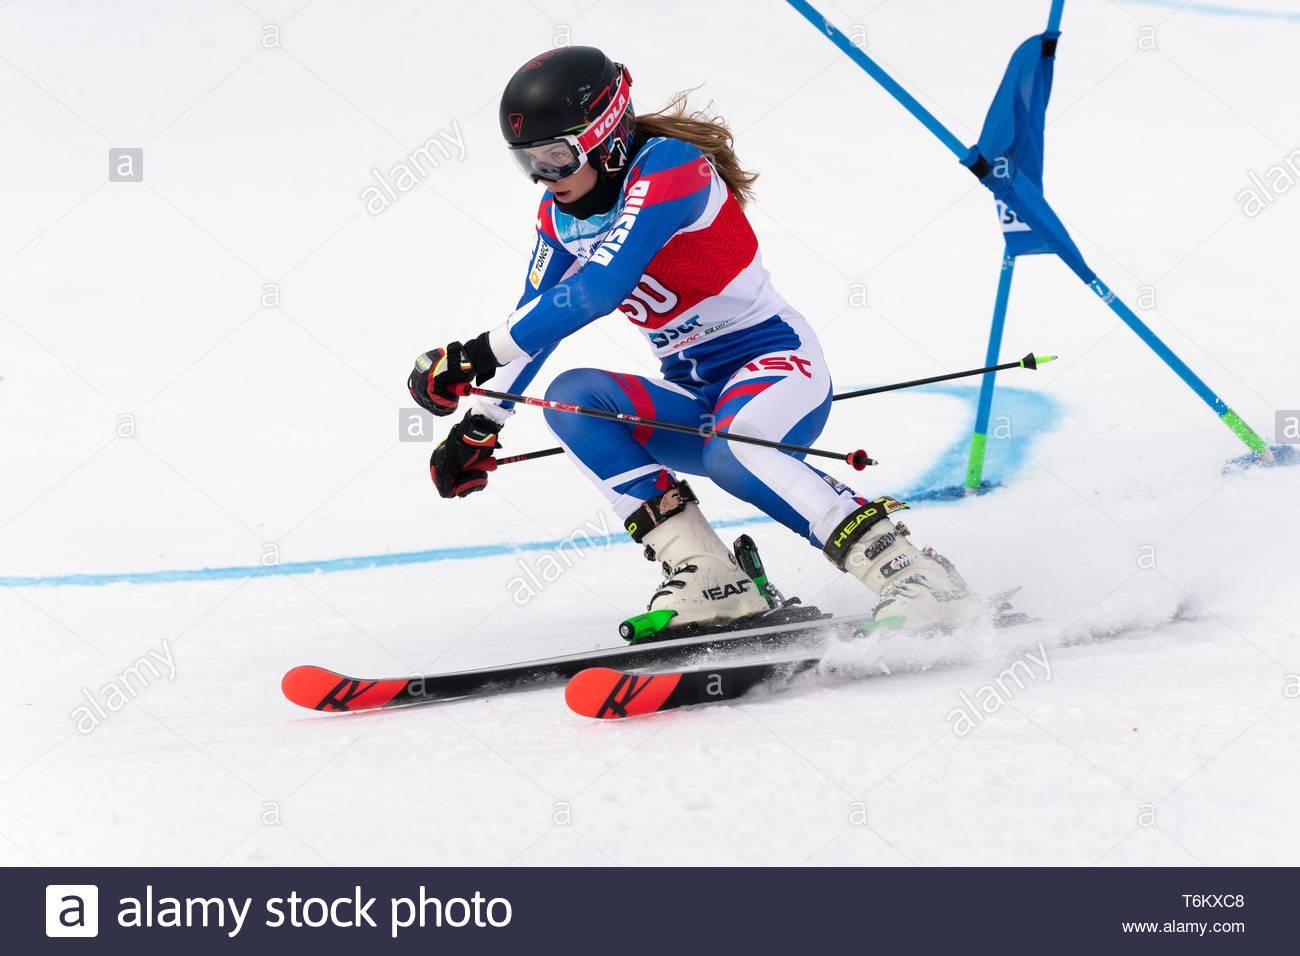 KAMCHATKA, RUSSIA - APRIL 2, 2019: Mountain skier Ulyana Lendya (Kamchatka Peninsula) skiing down mount slope. Russian Women's Alpine Skiing Cup, Inte - Stock Image